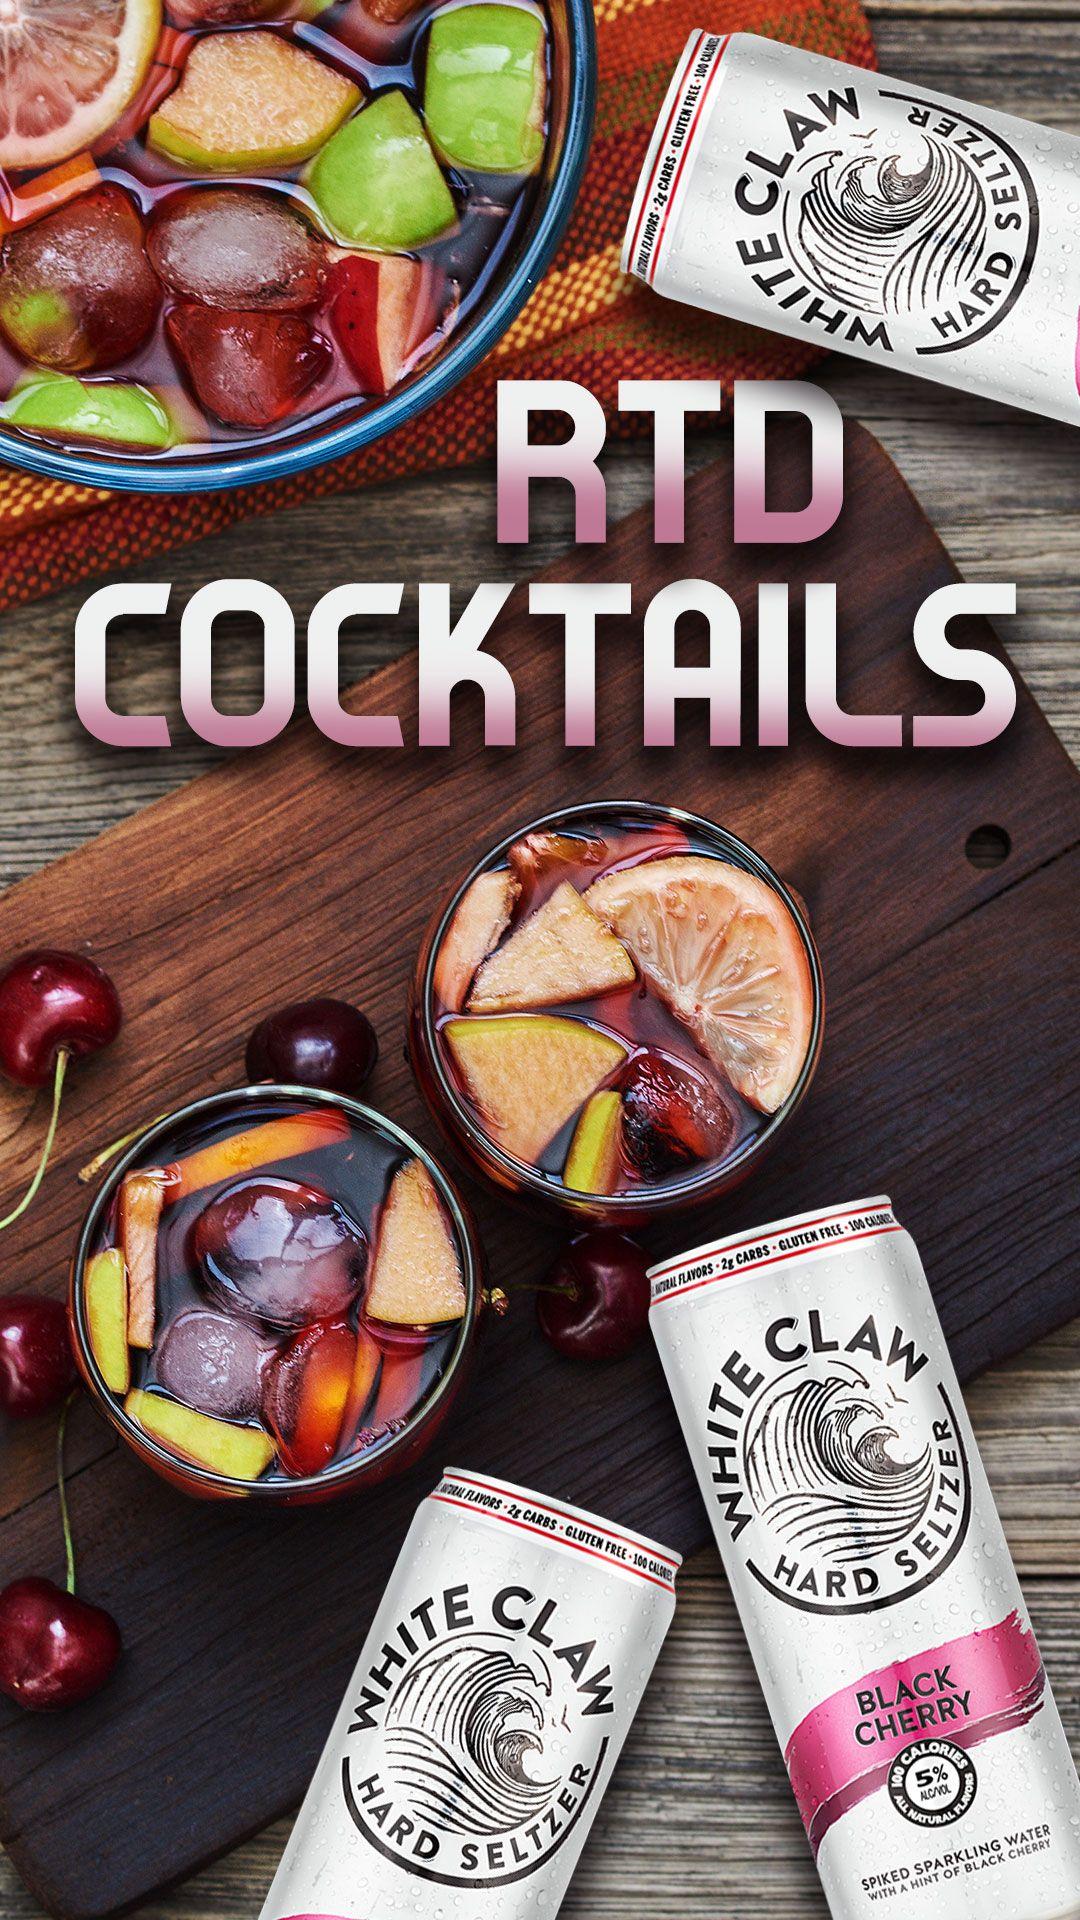 Hard seltzer cocktails specs wines spirits finer